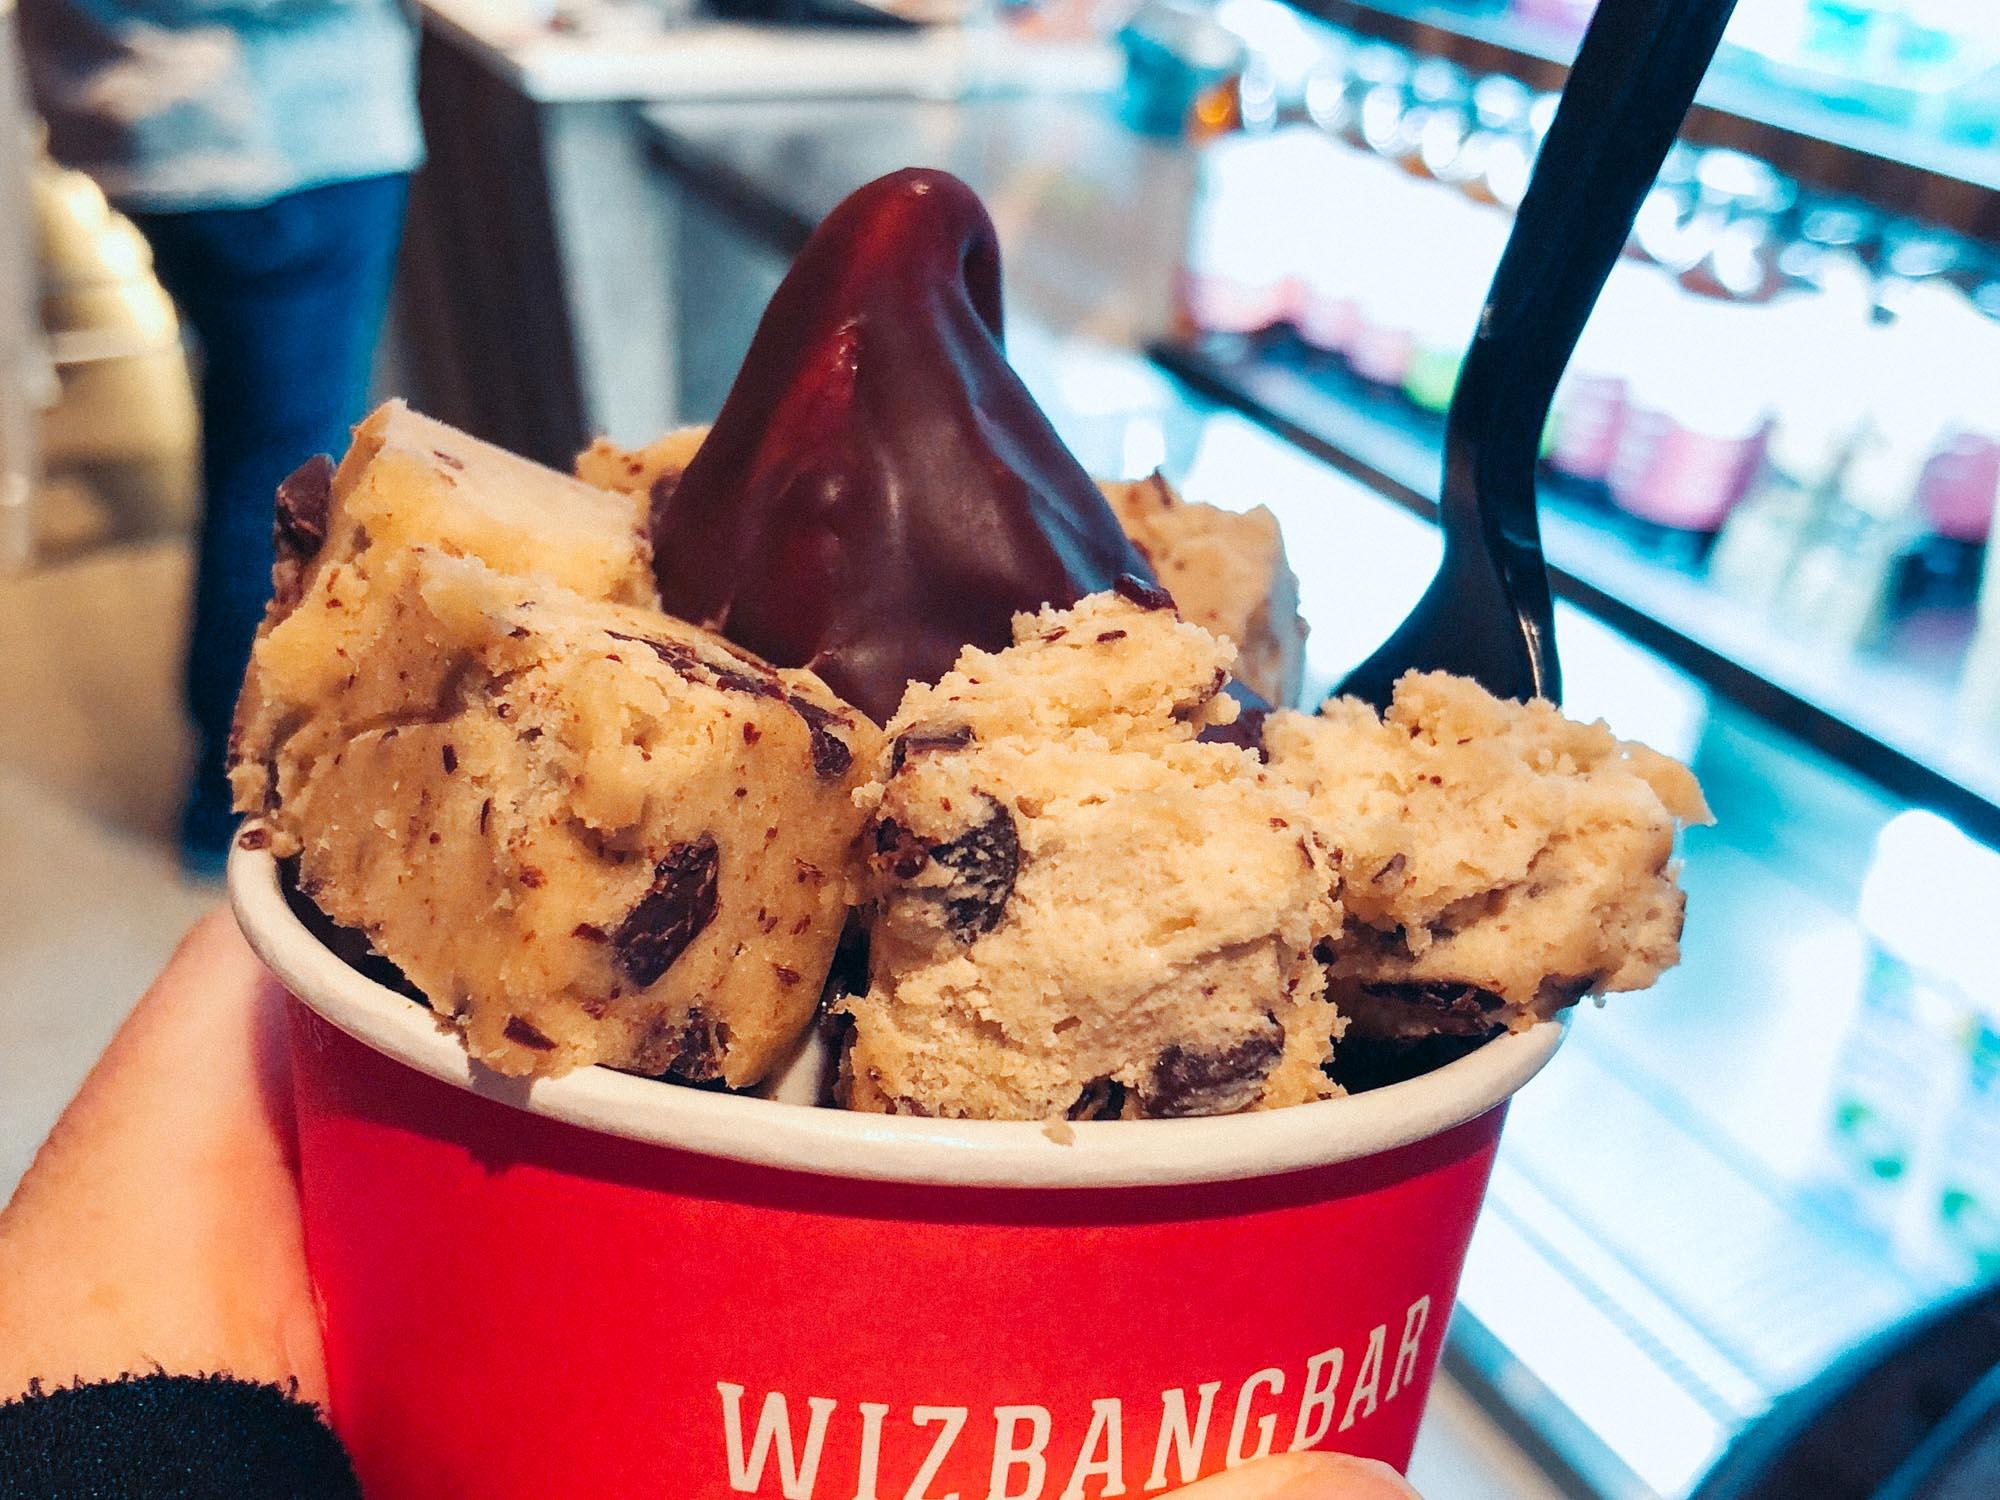 Best vegetarian restaurants in Portland - Wiz Bang Bar